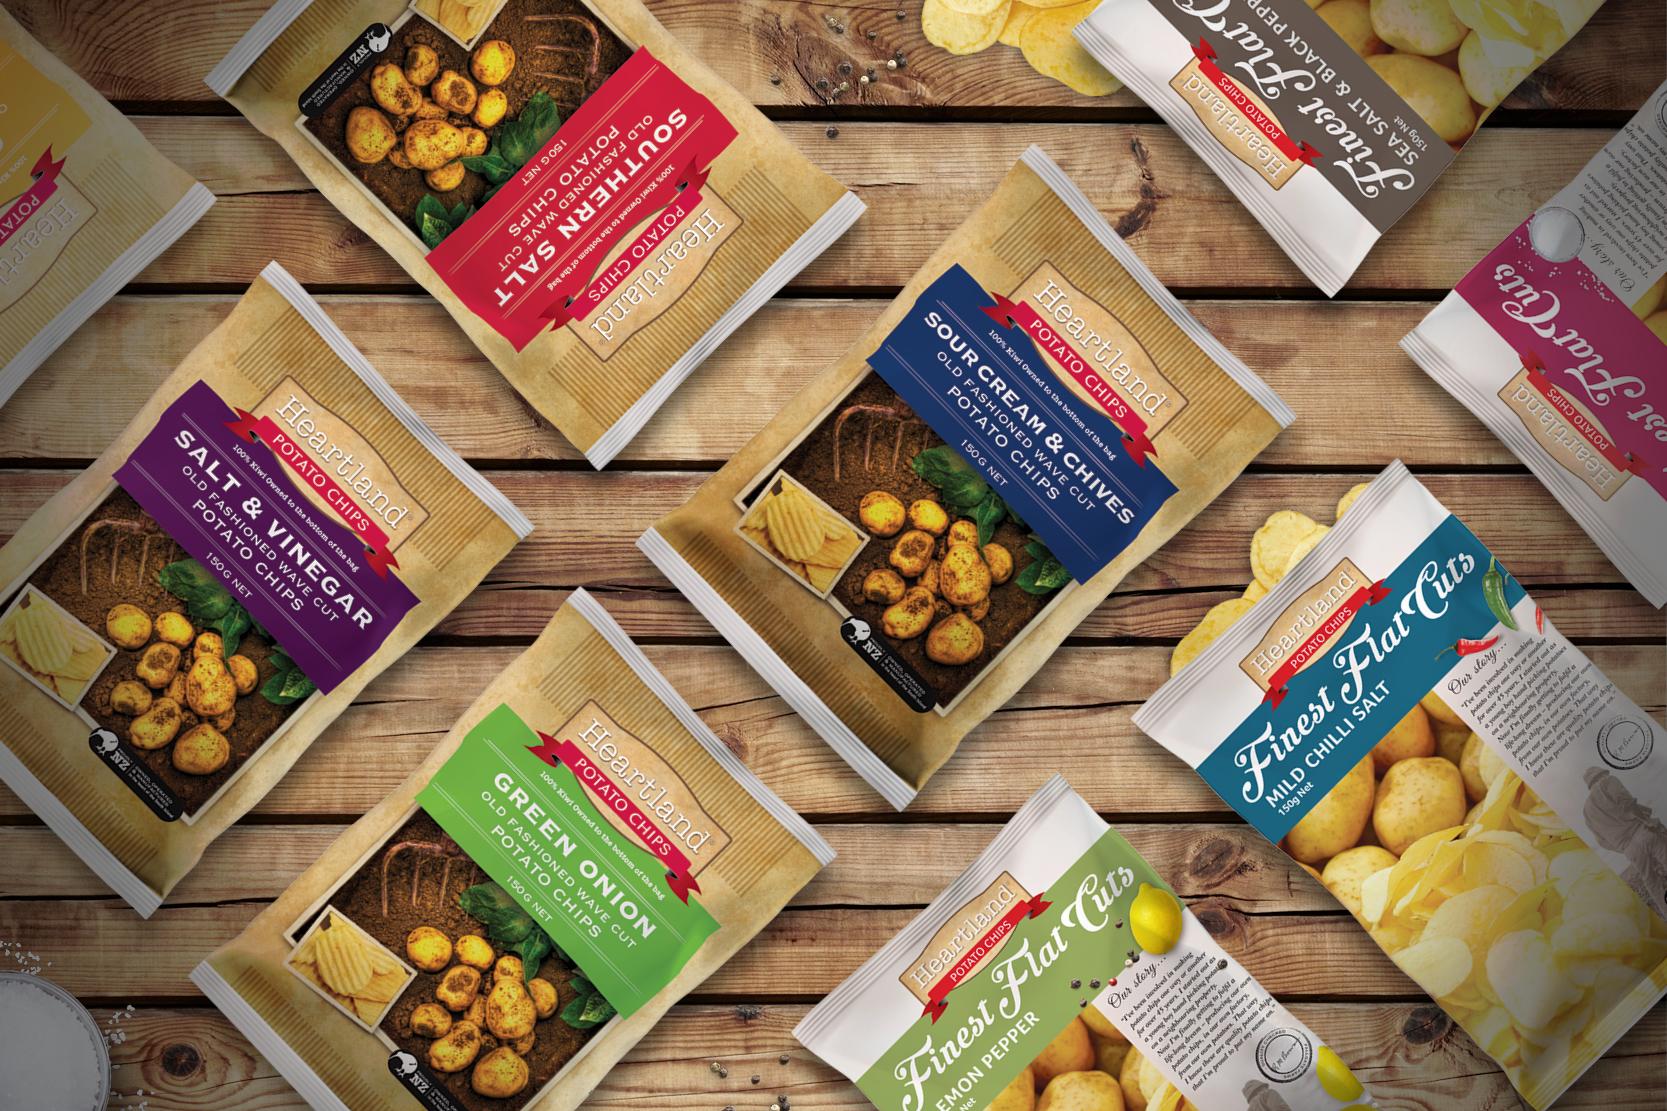 Heartland chip packaging